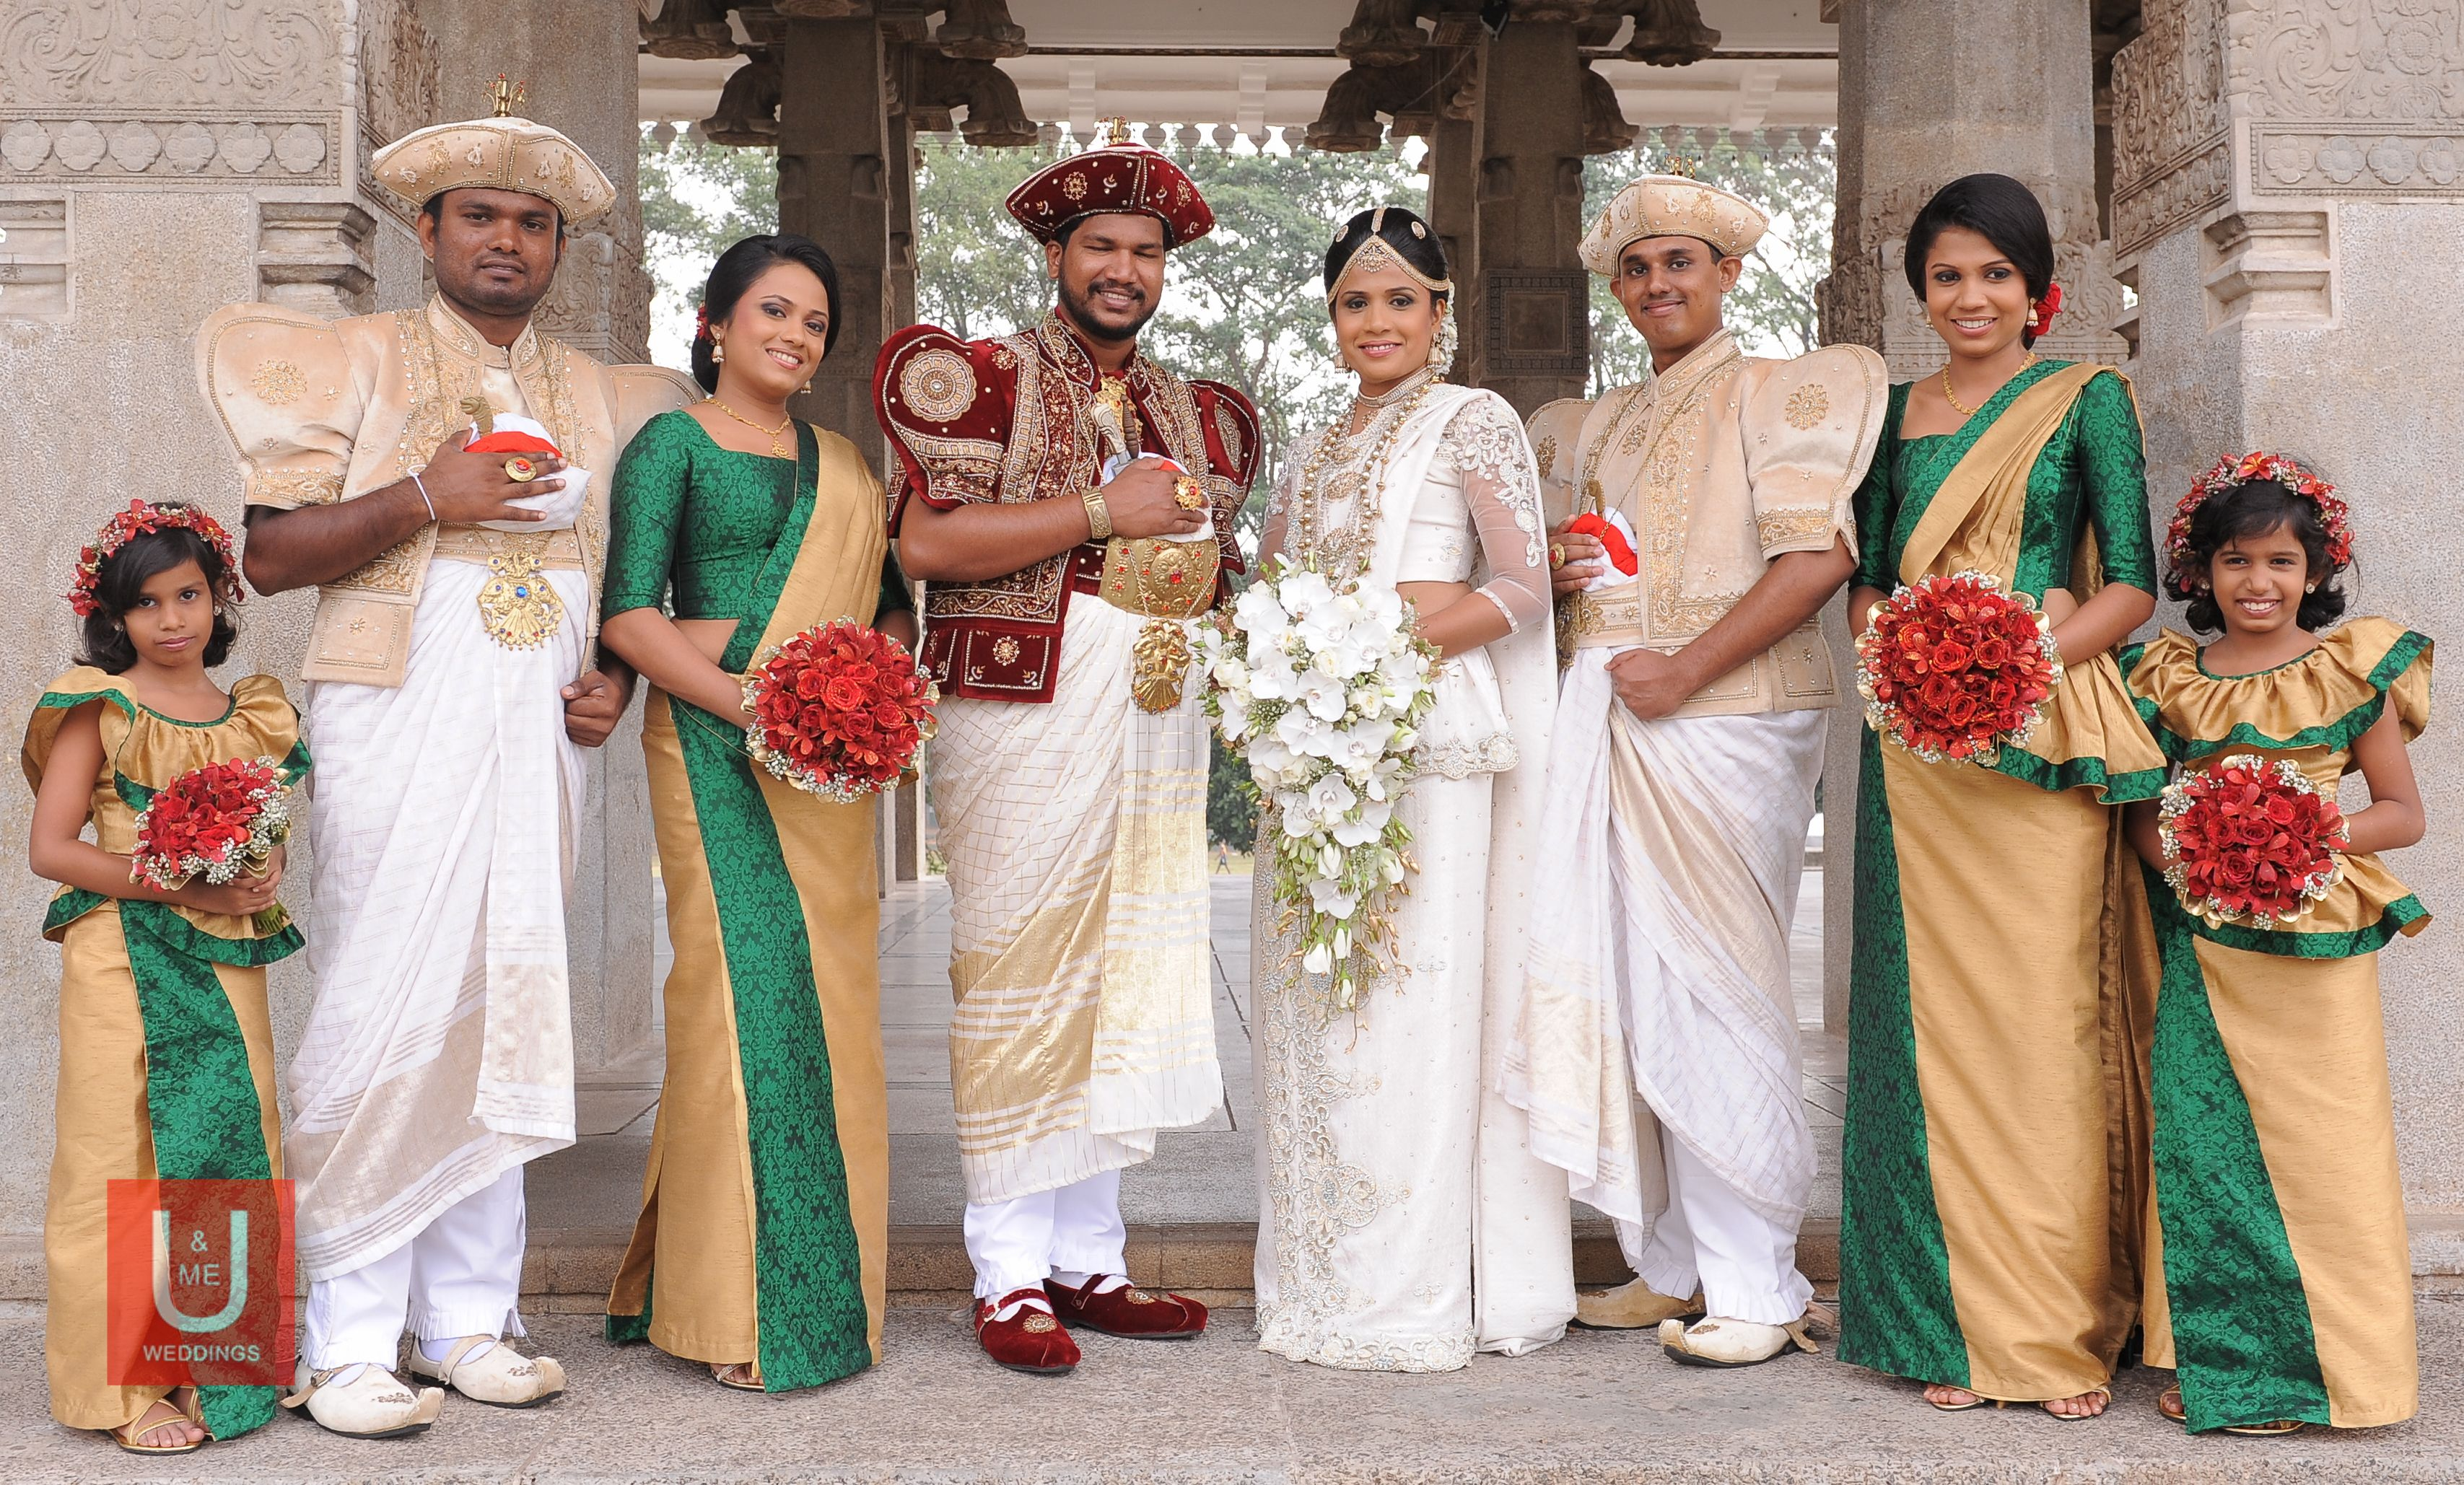 Sri Lankan Traditional Wedding Group Photo